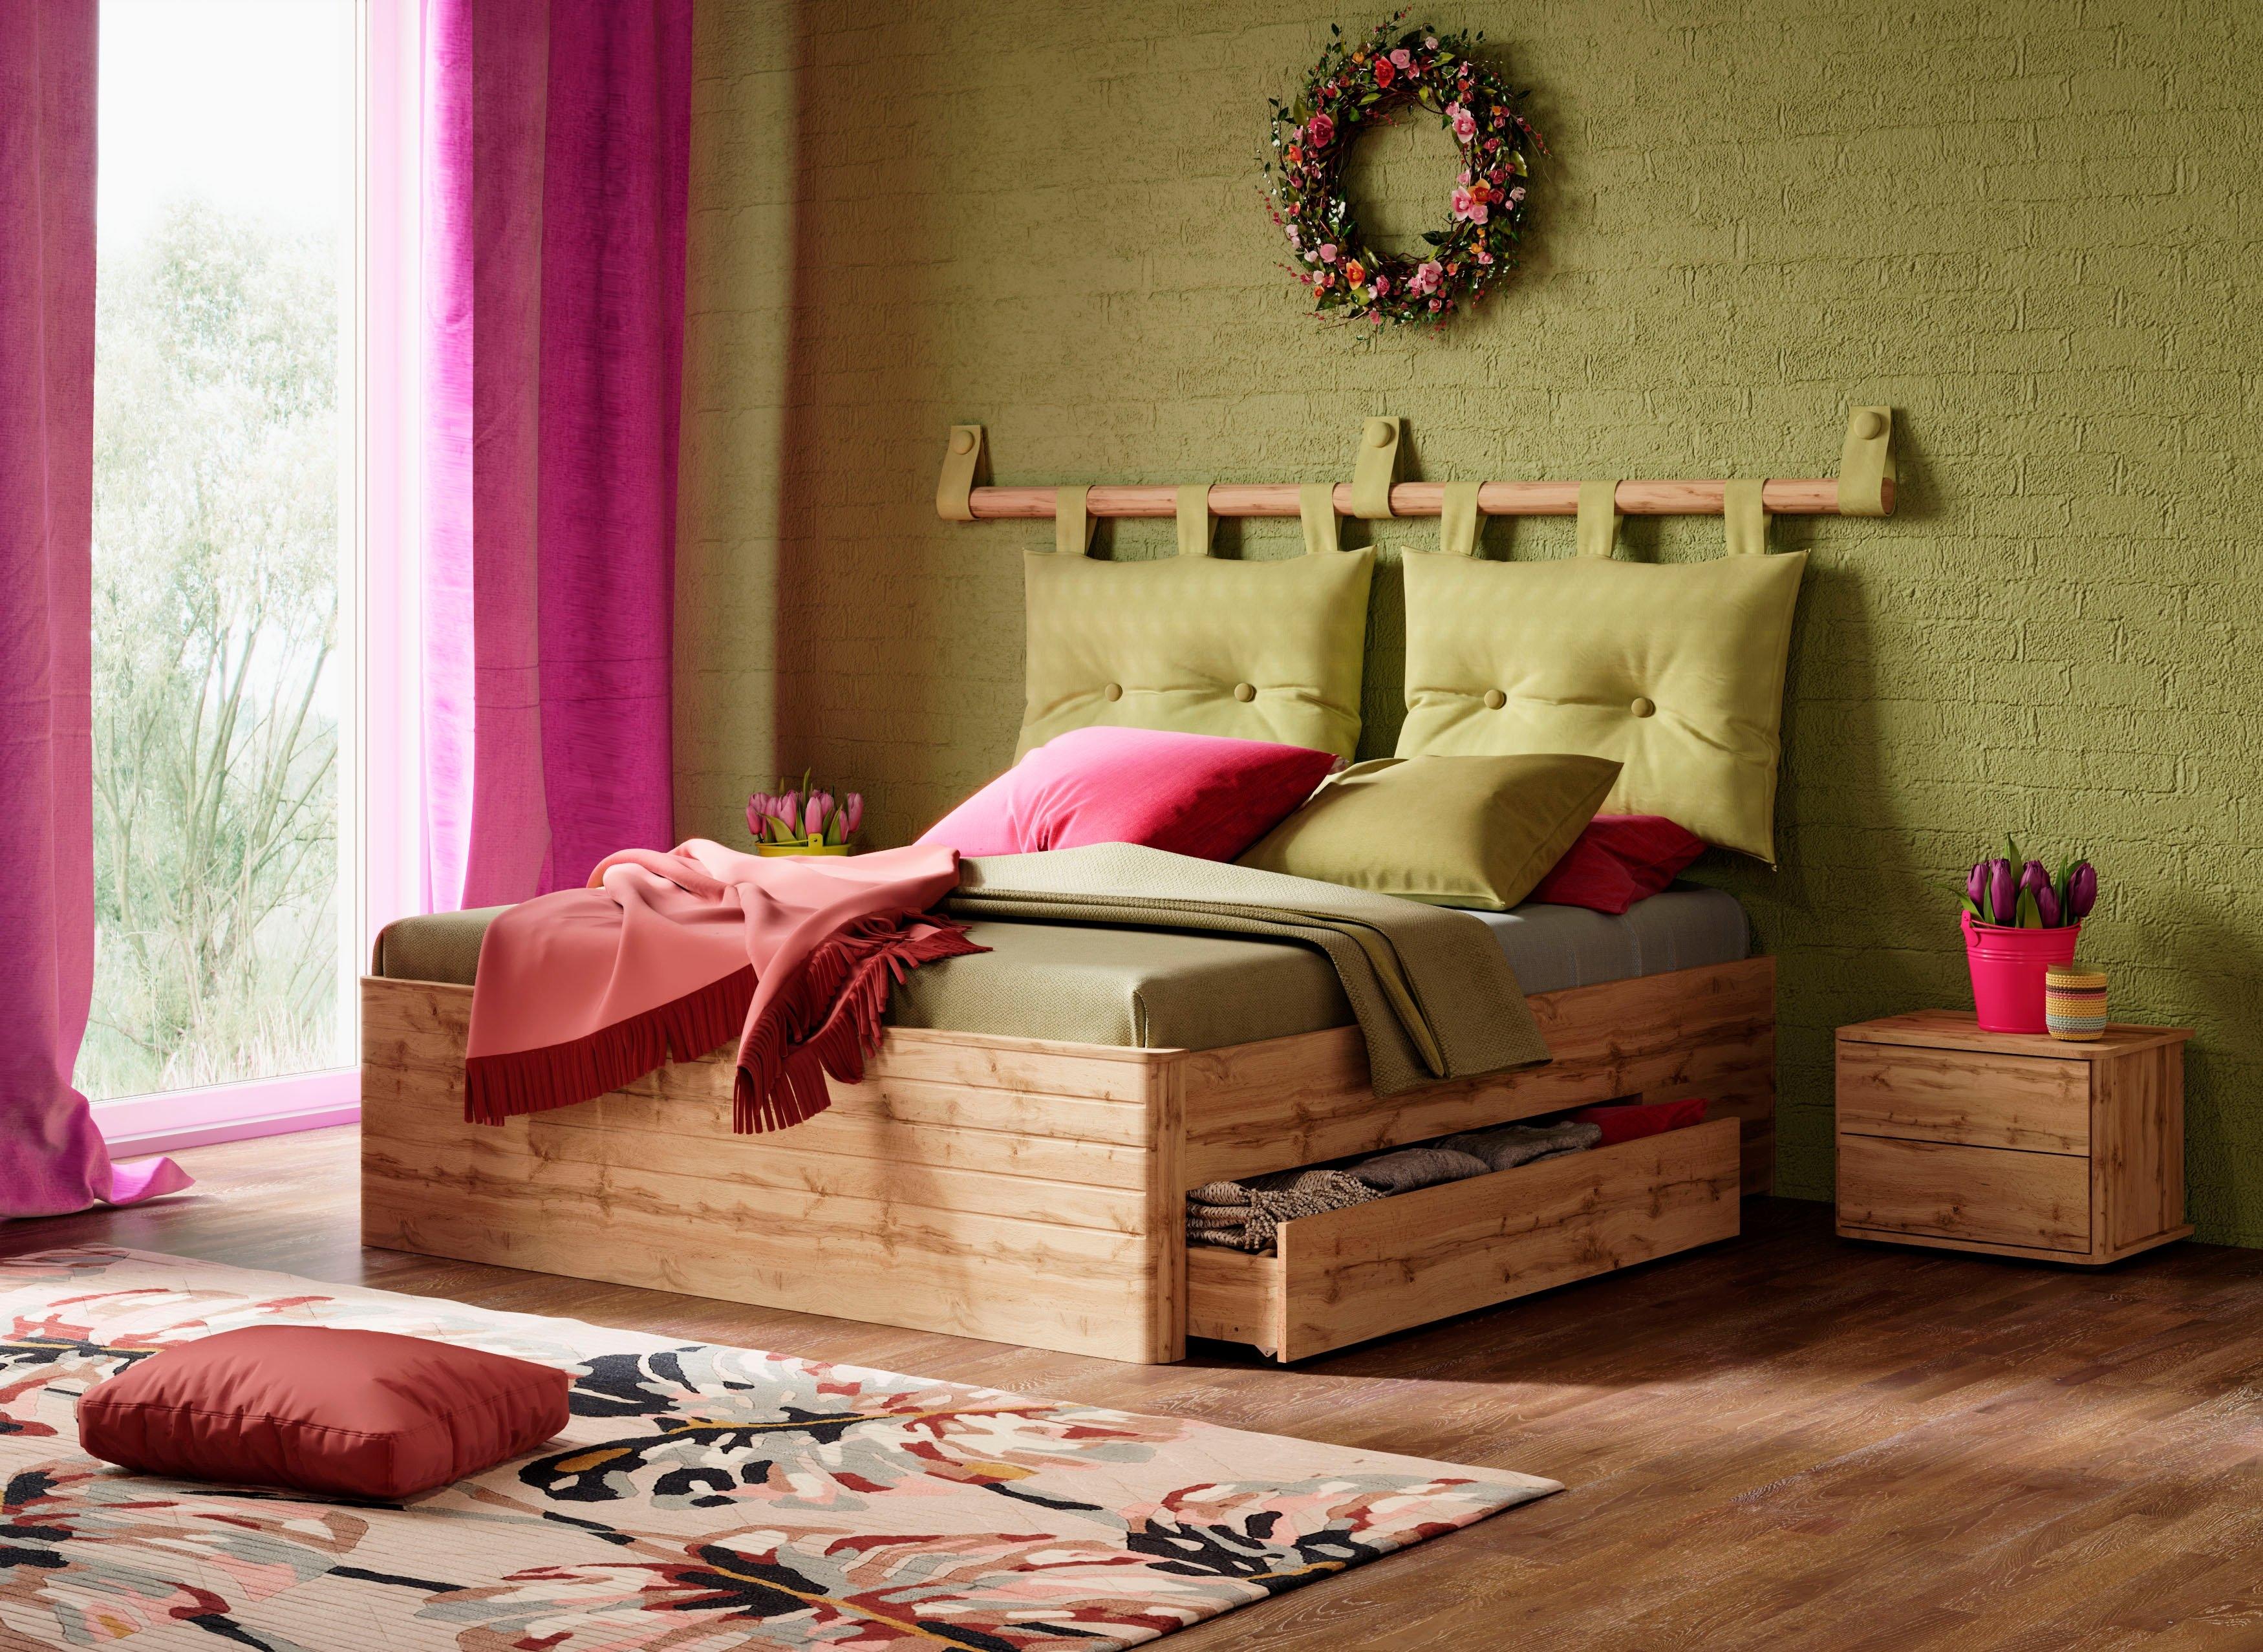 Home affaire bed »Eskil« nu online bestellen